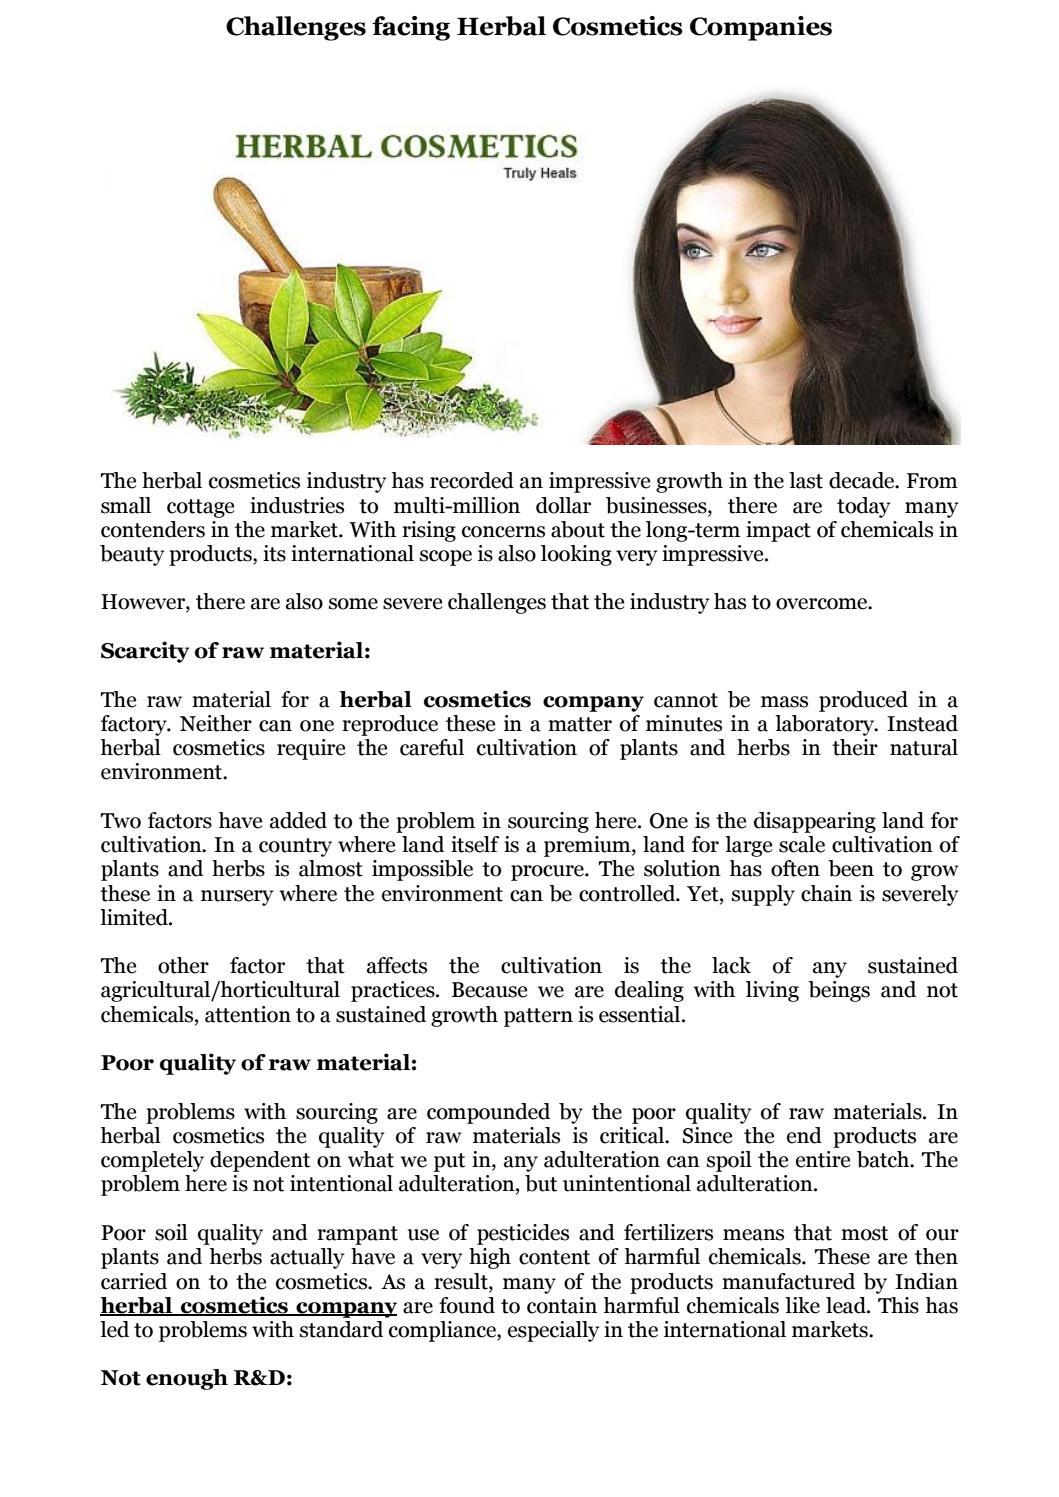 Challenges facing herbal cosmetics companies by everydayherbal - issuu